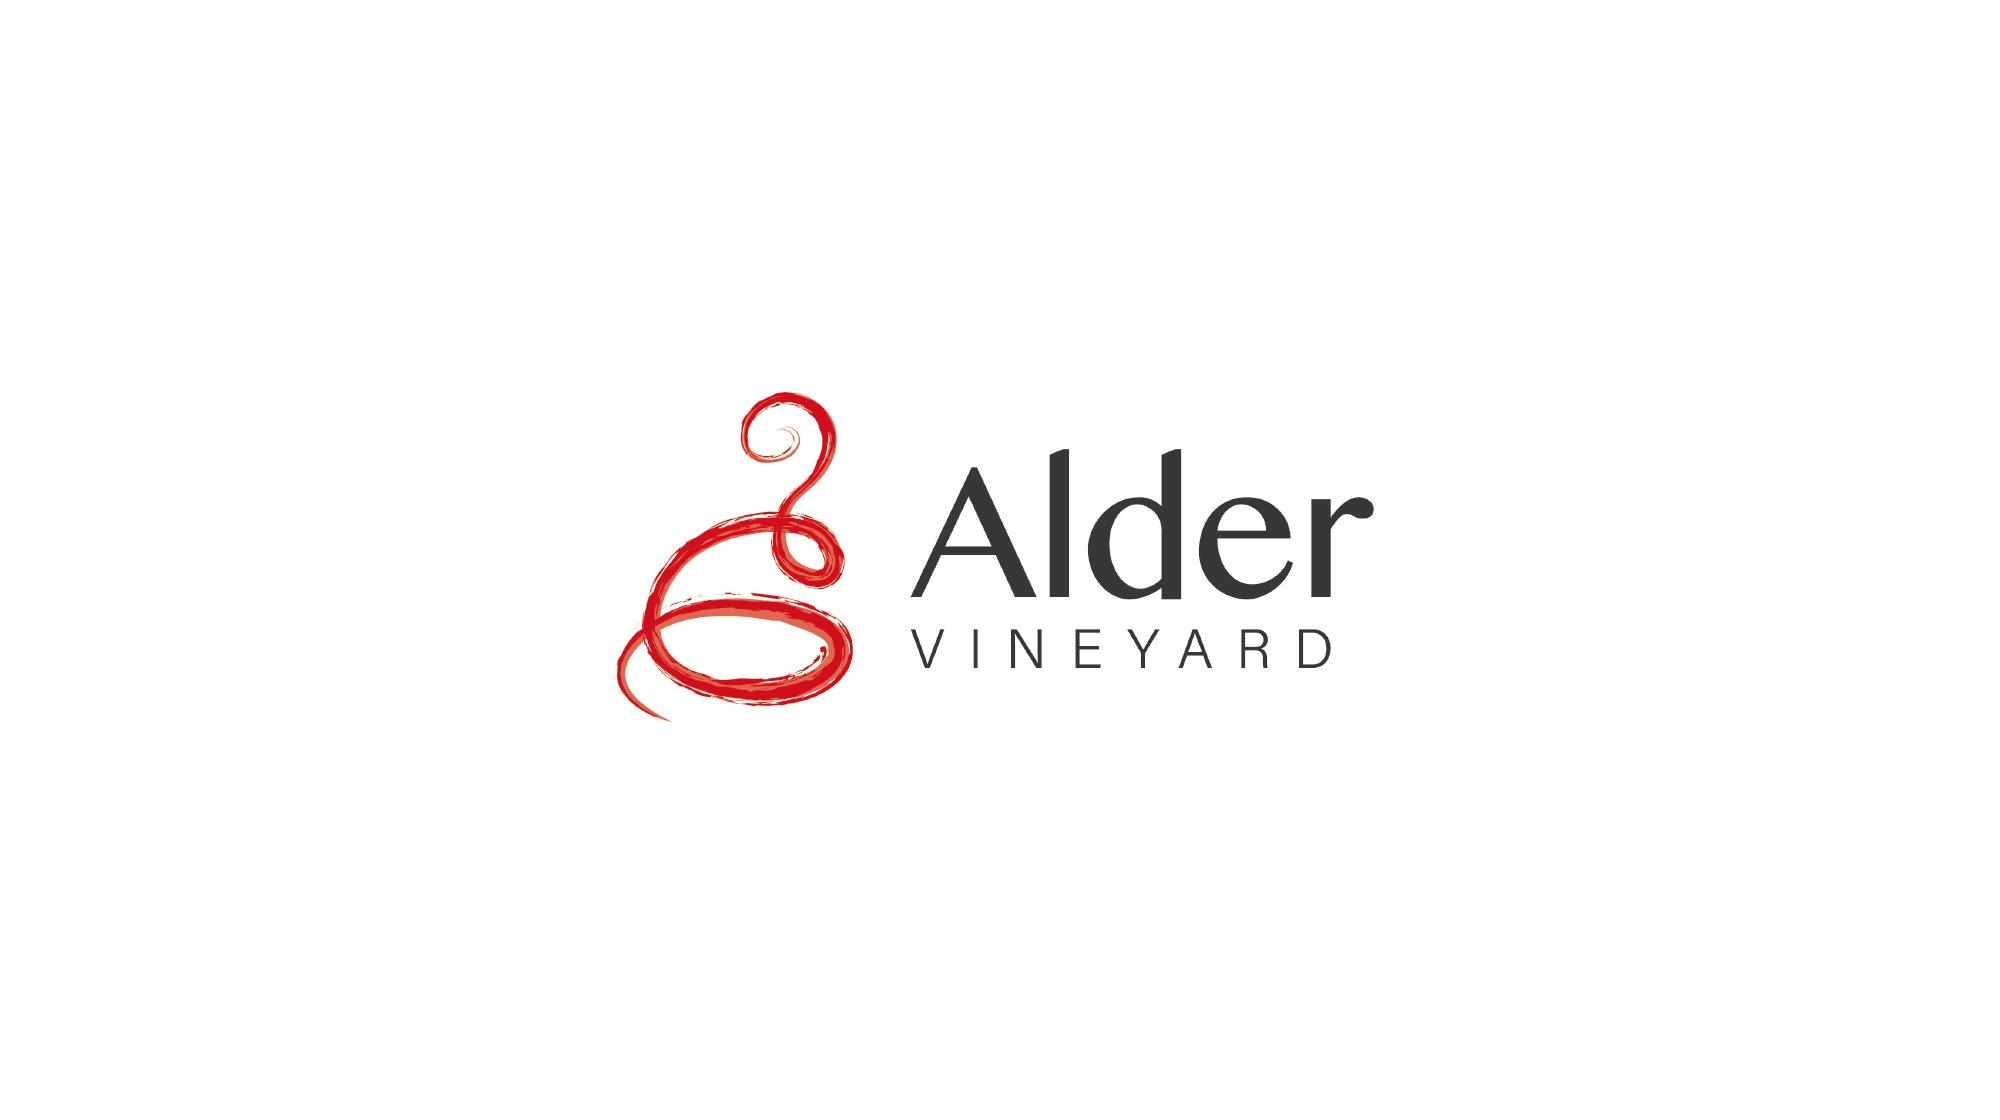 Logo header - Alder Vineyard Branding